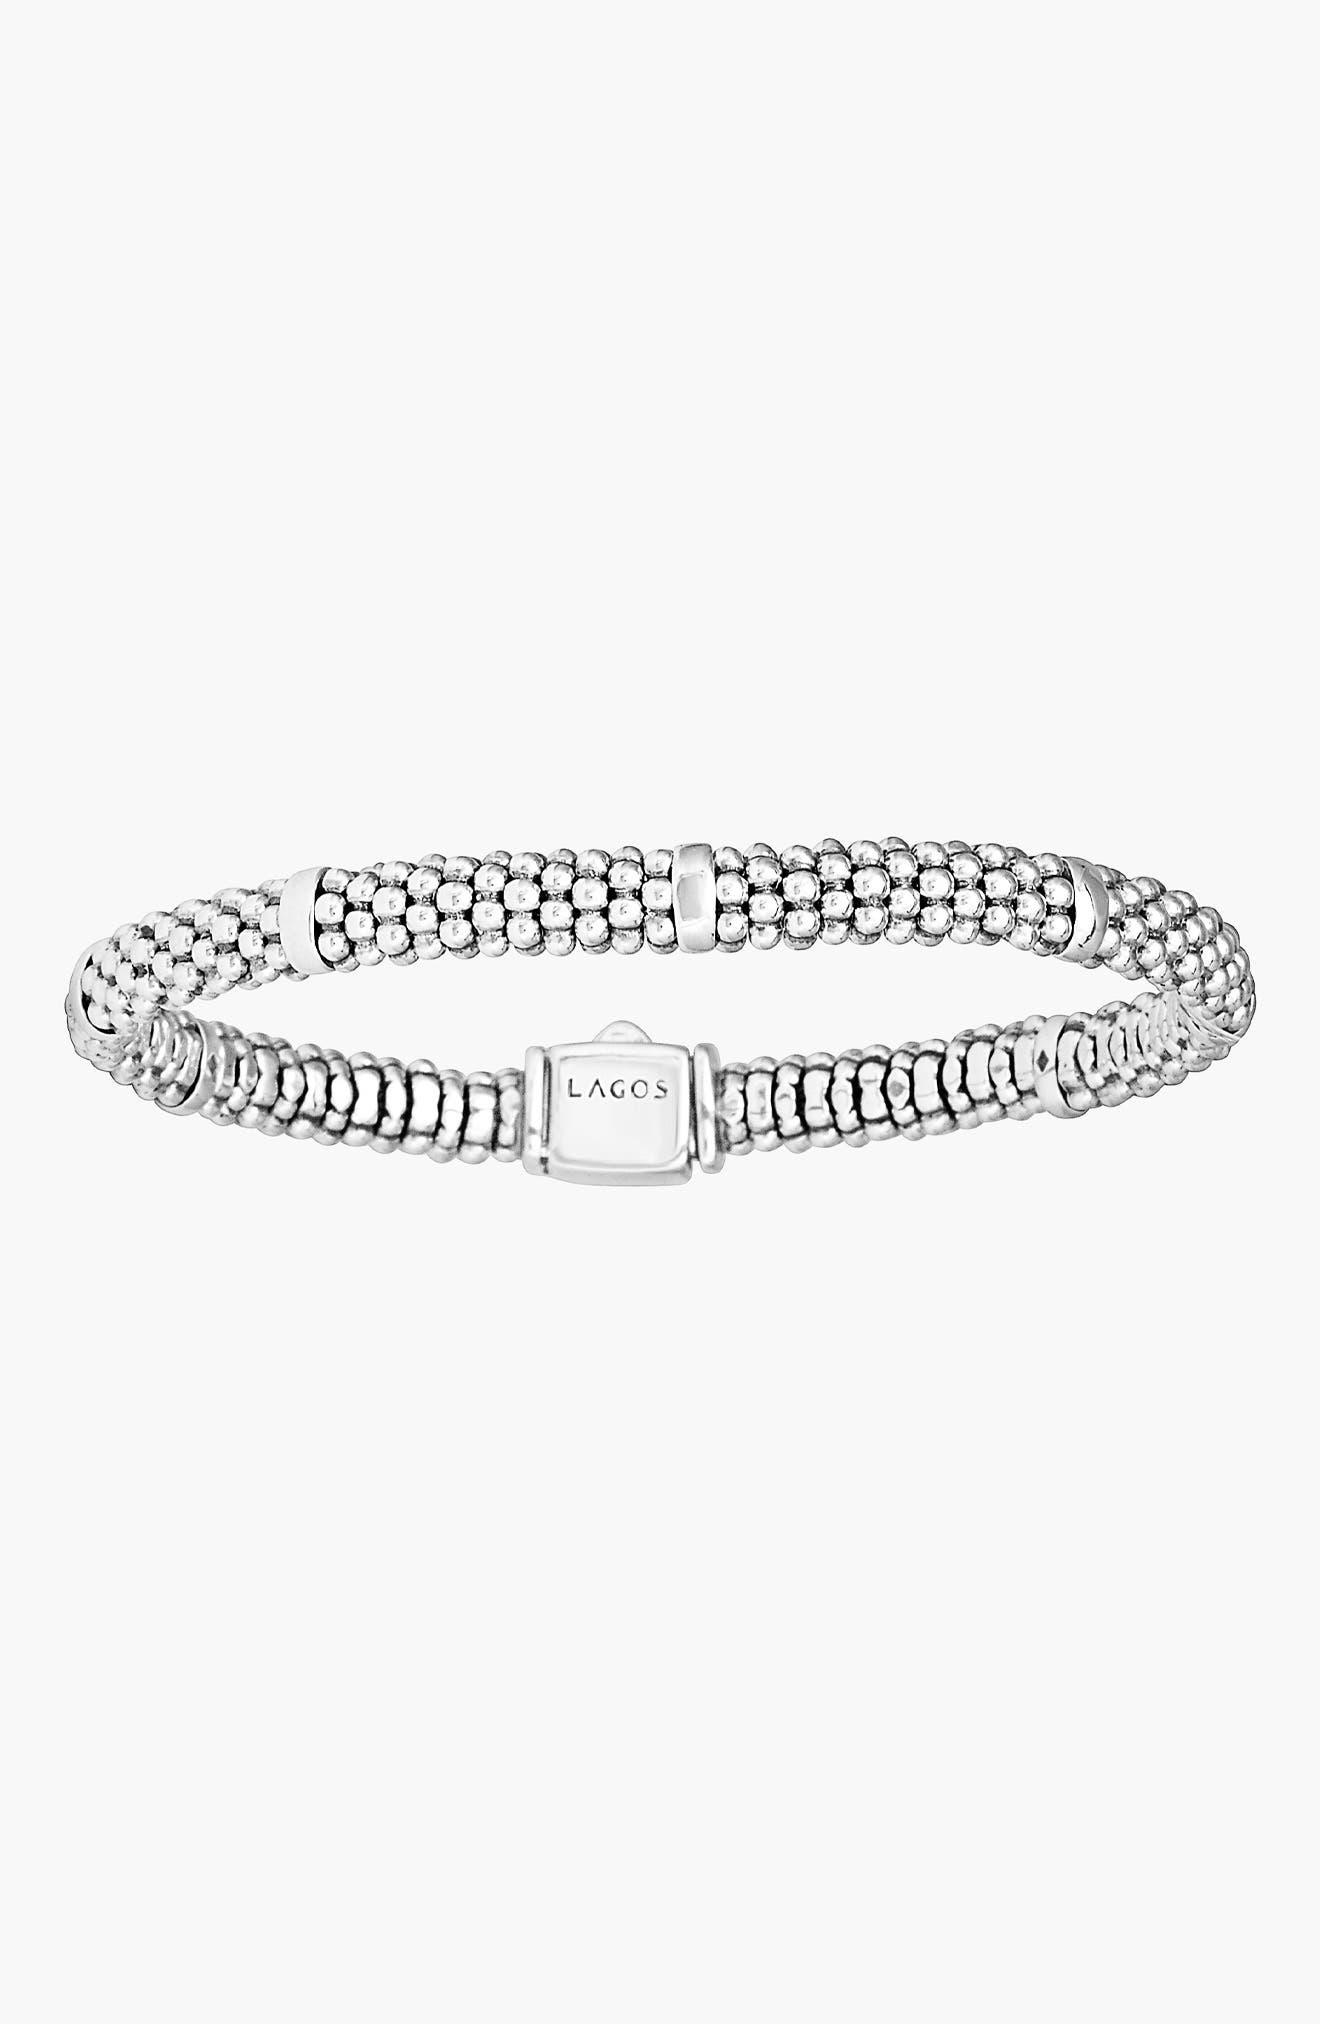 Caviar Rope Station Bracelet,                             Alternate thumbnail 7, color,                             040